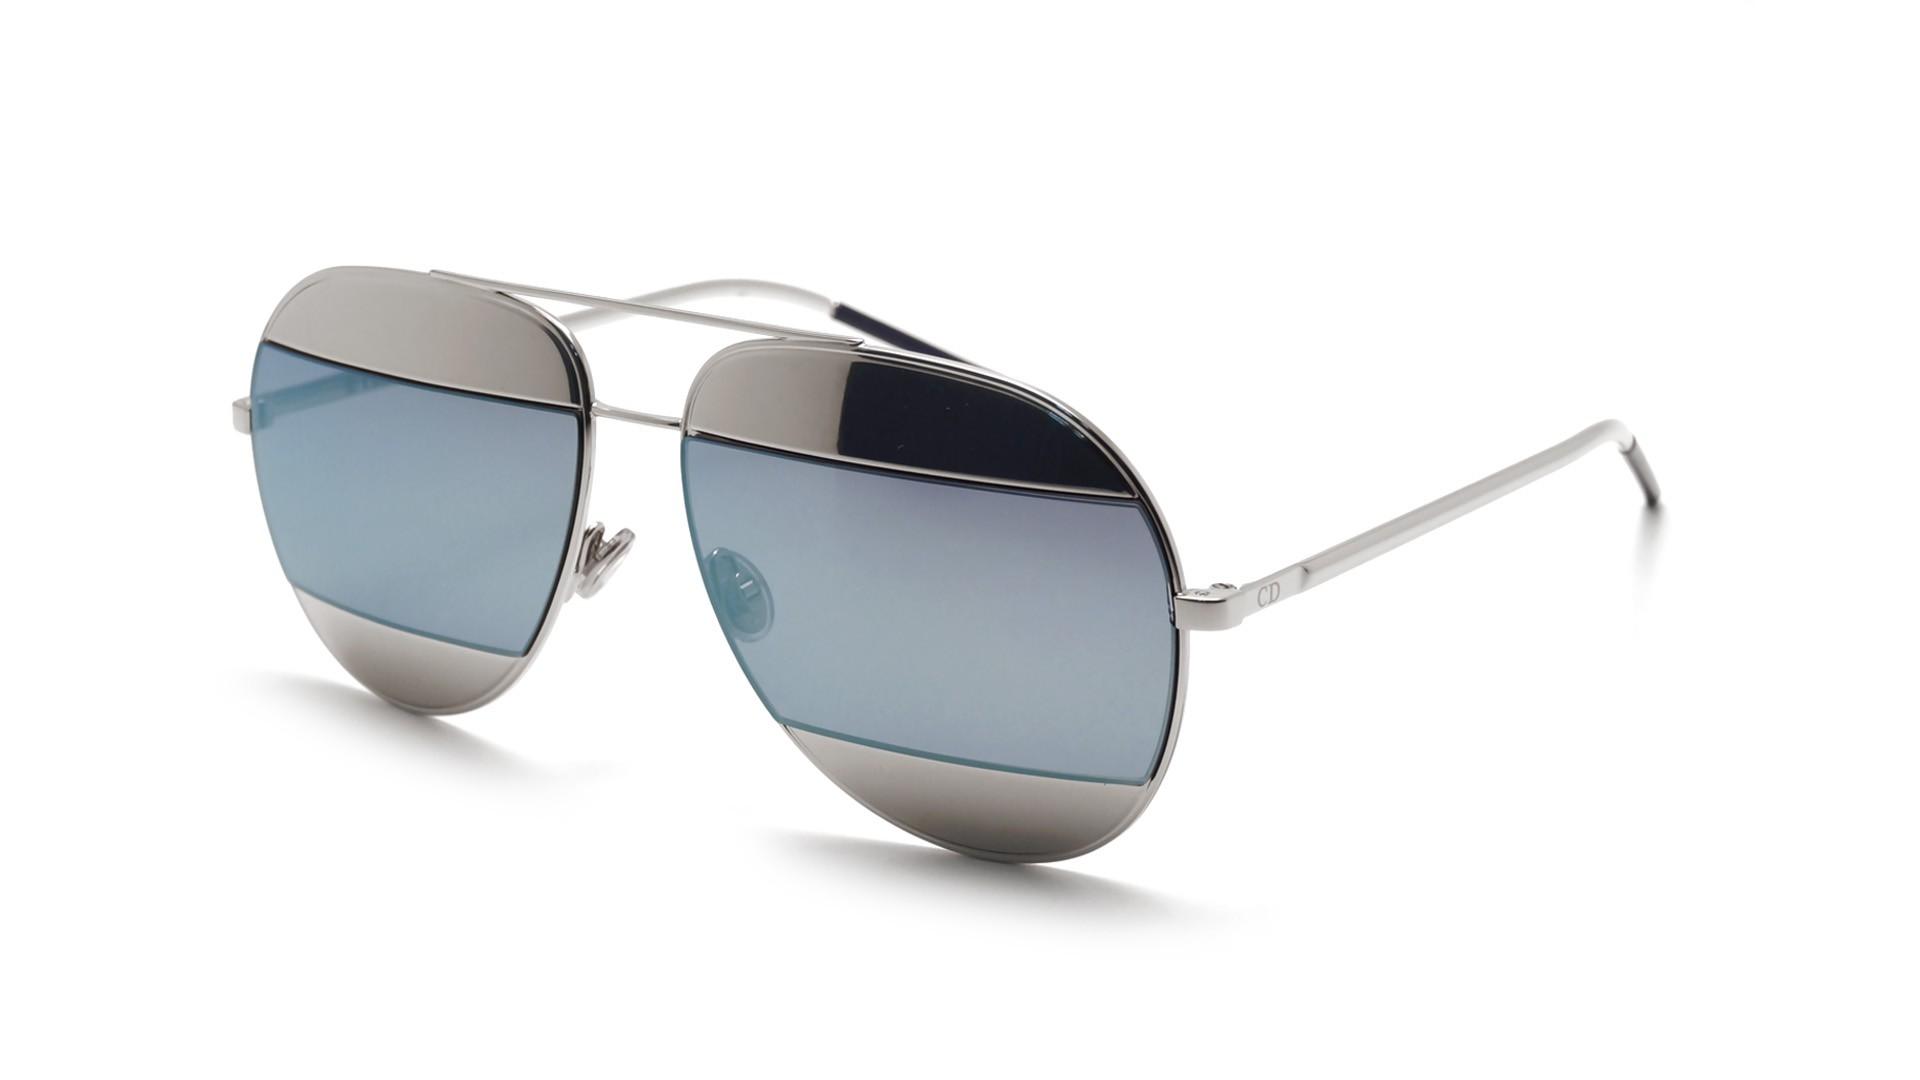 0ff0c267356d Sunglasses Dior Split 1 Silver SPLIT1 0103J 59-14 Large Flash